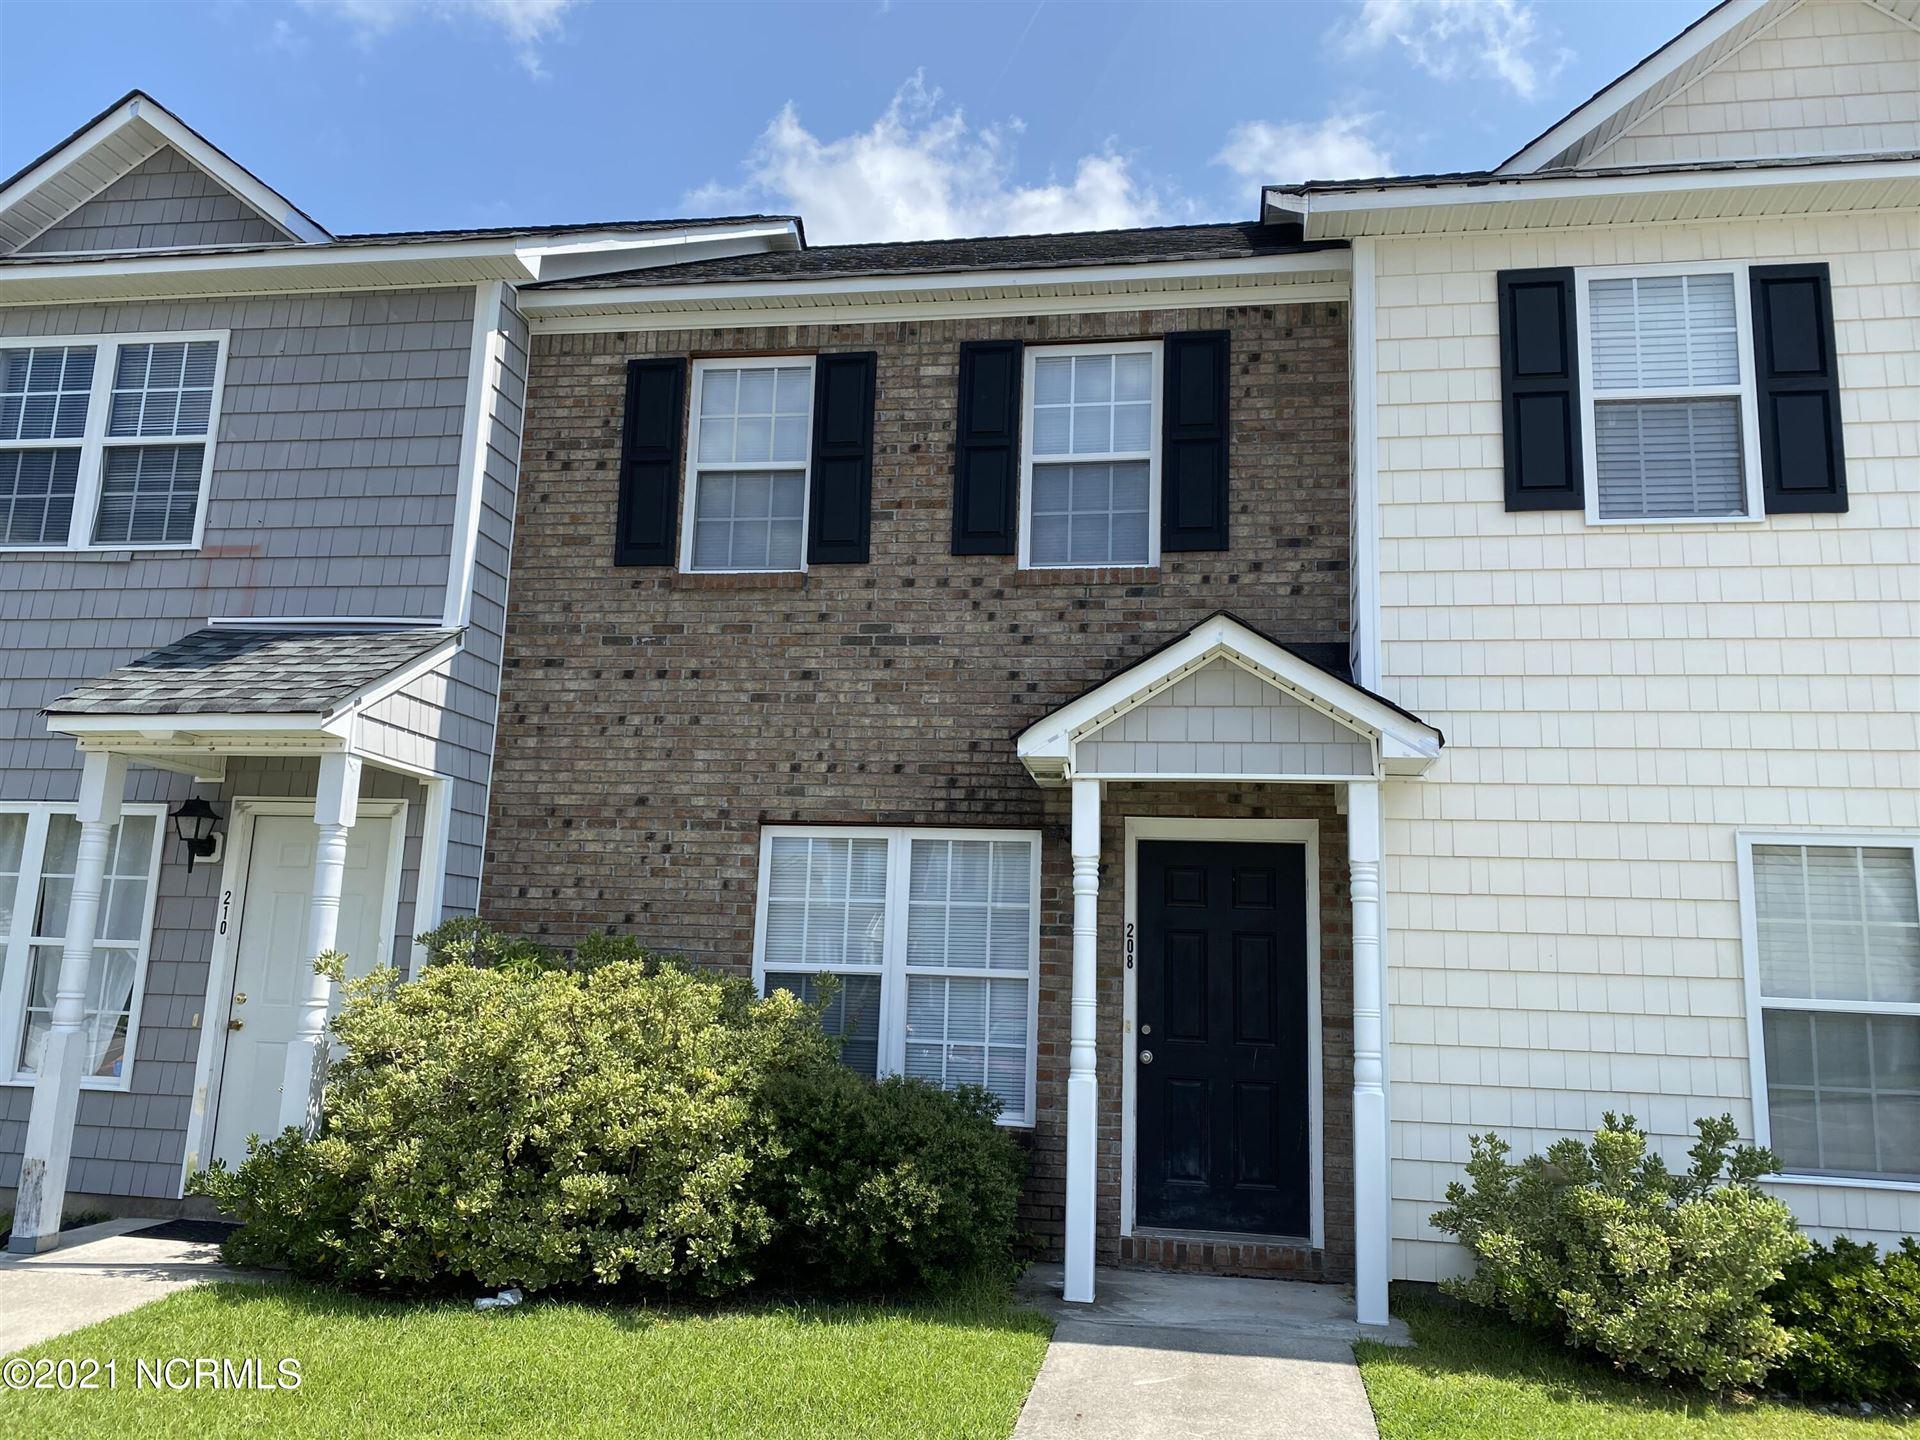 Photo of 208 Bridgewood Drive, Jacksonville, NC 28546 (MLS # 100290224)